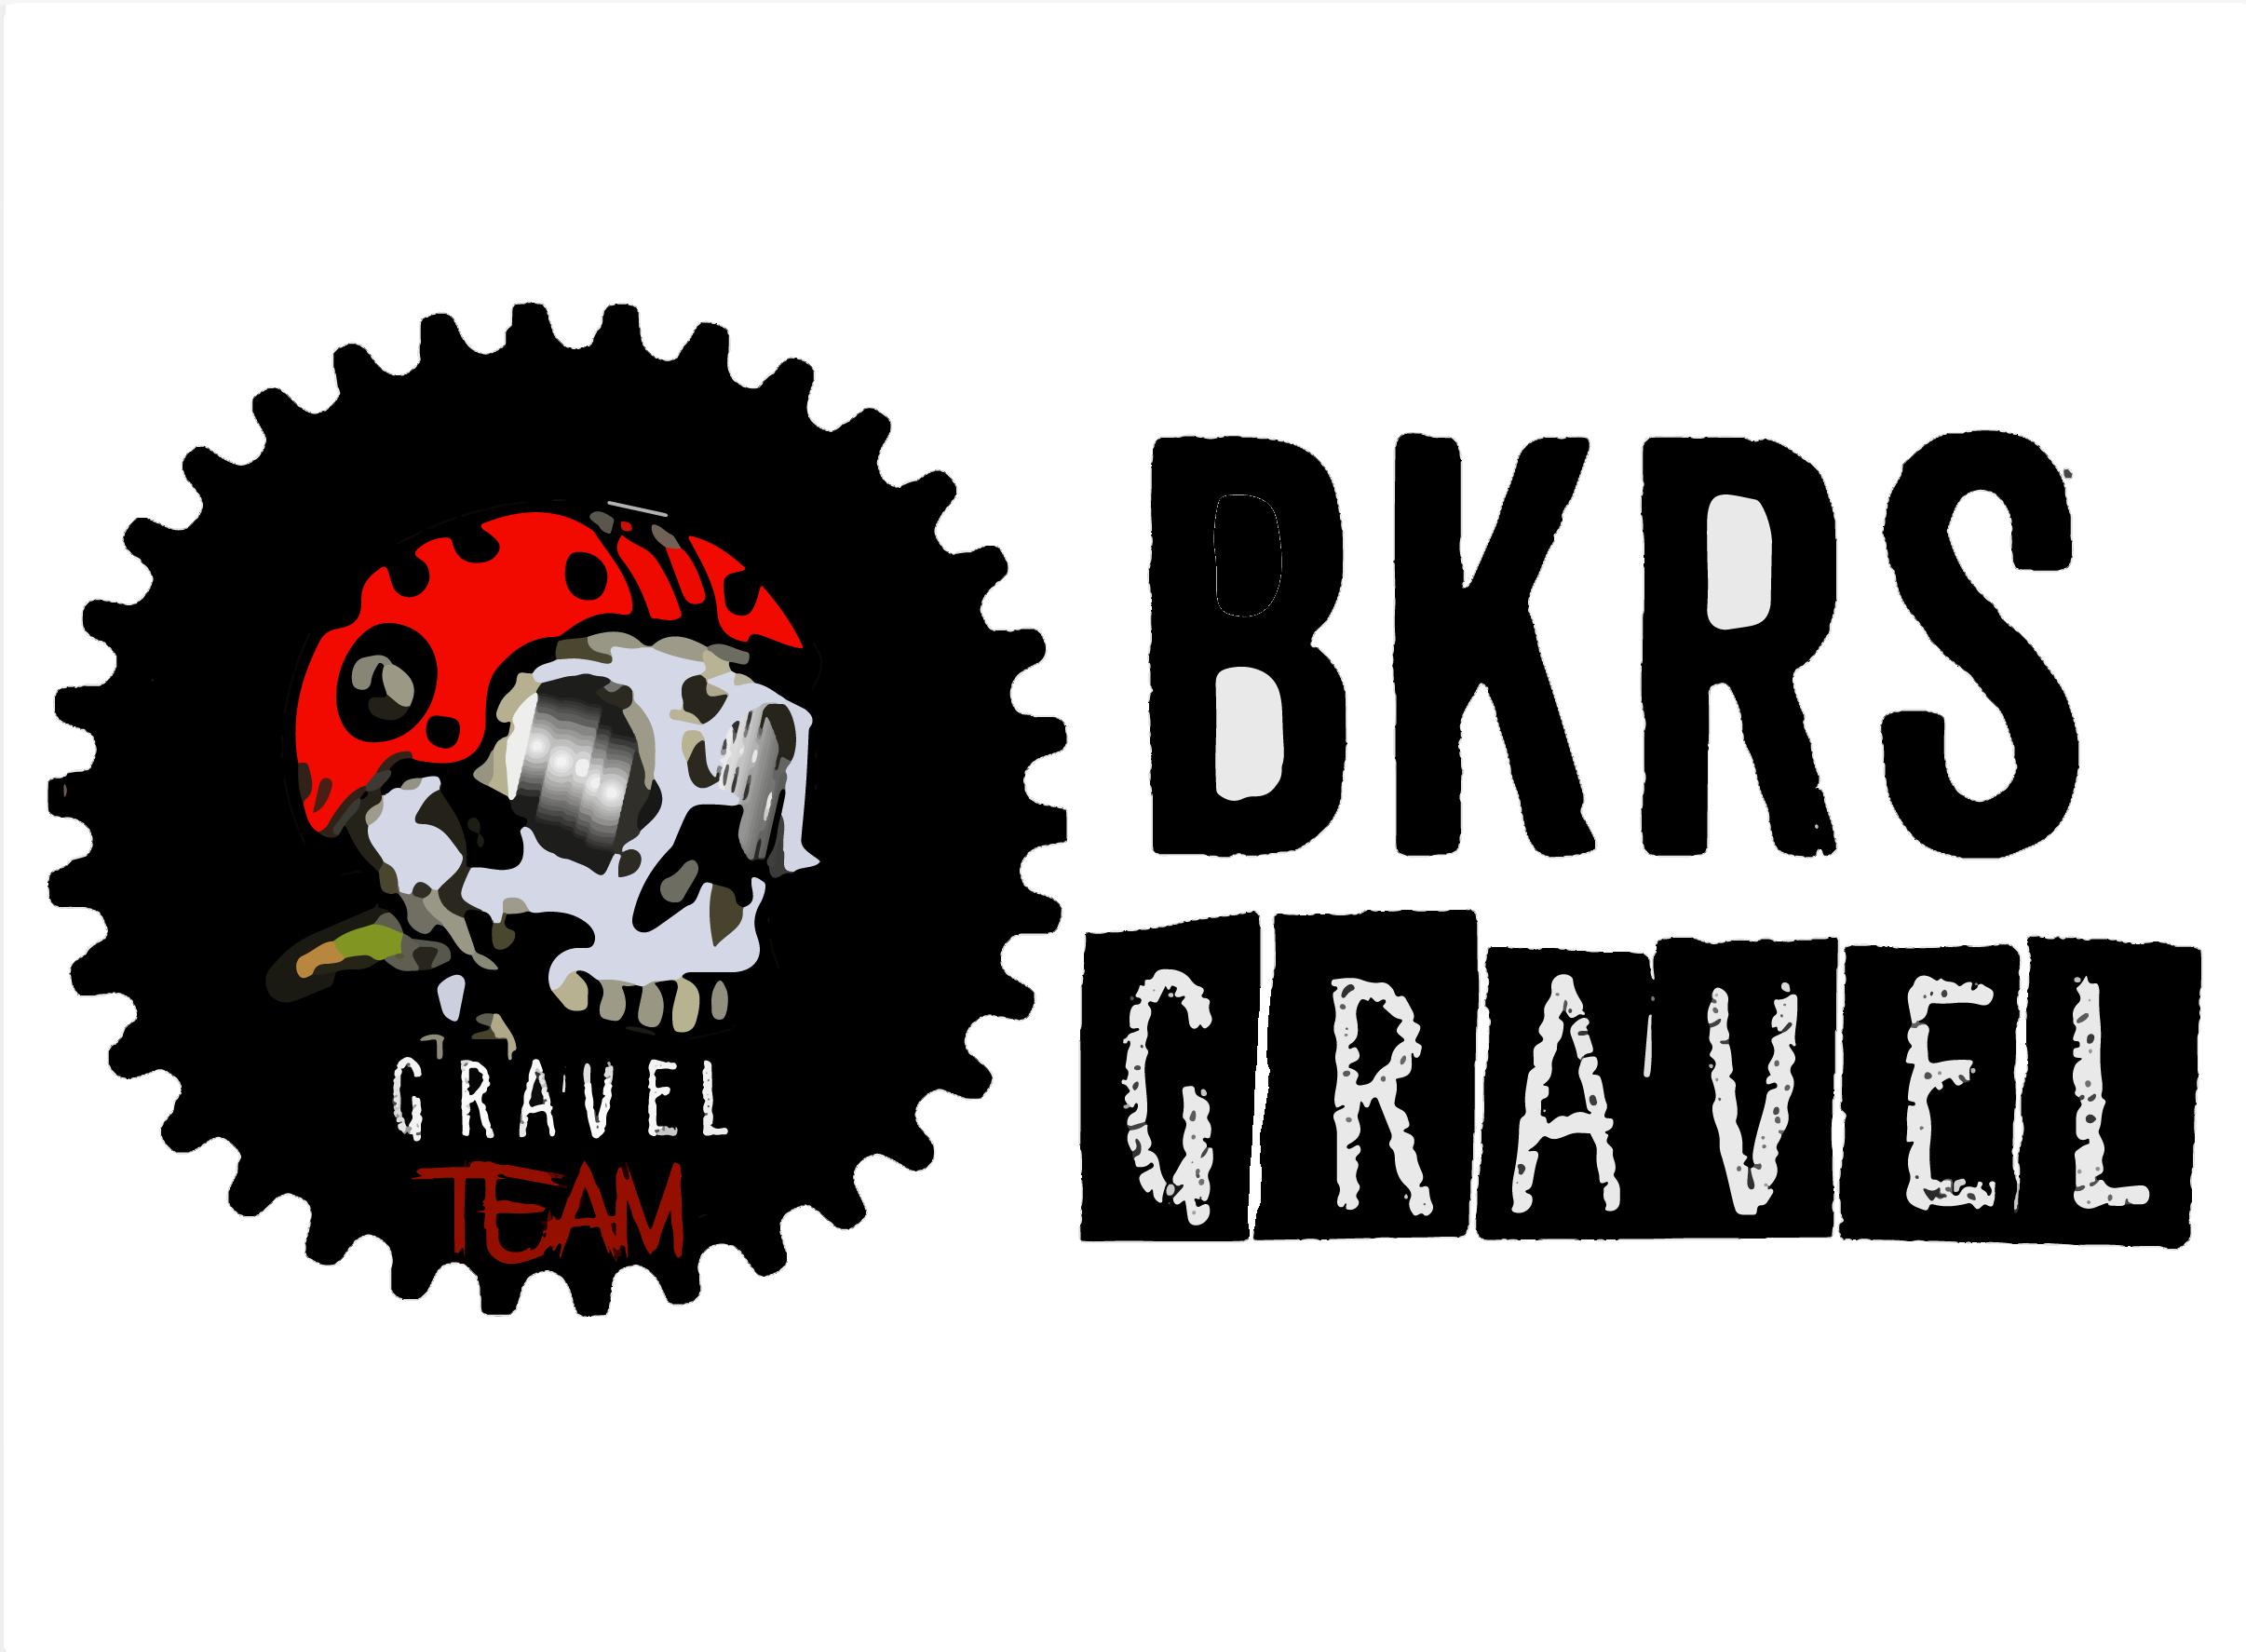 BKRS GRAVEL